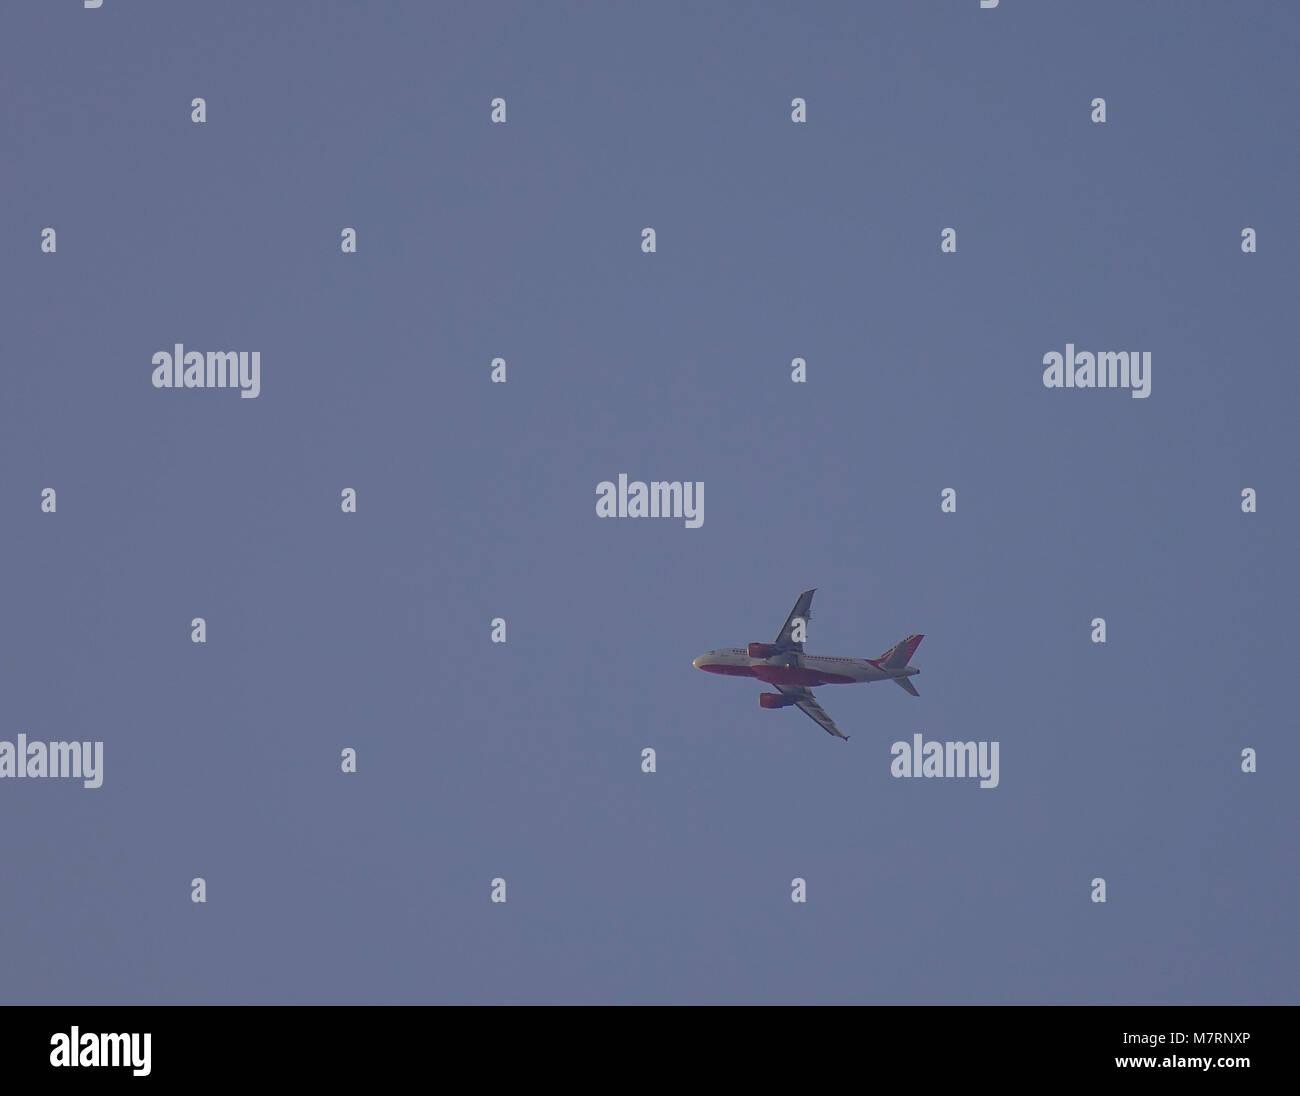 Kathmandu, Nepal - Oct 17, 2017. A civil aircraft flying in the sky in Kathmandu, Nepal. - Stock Image